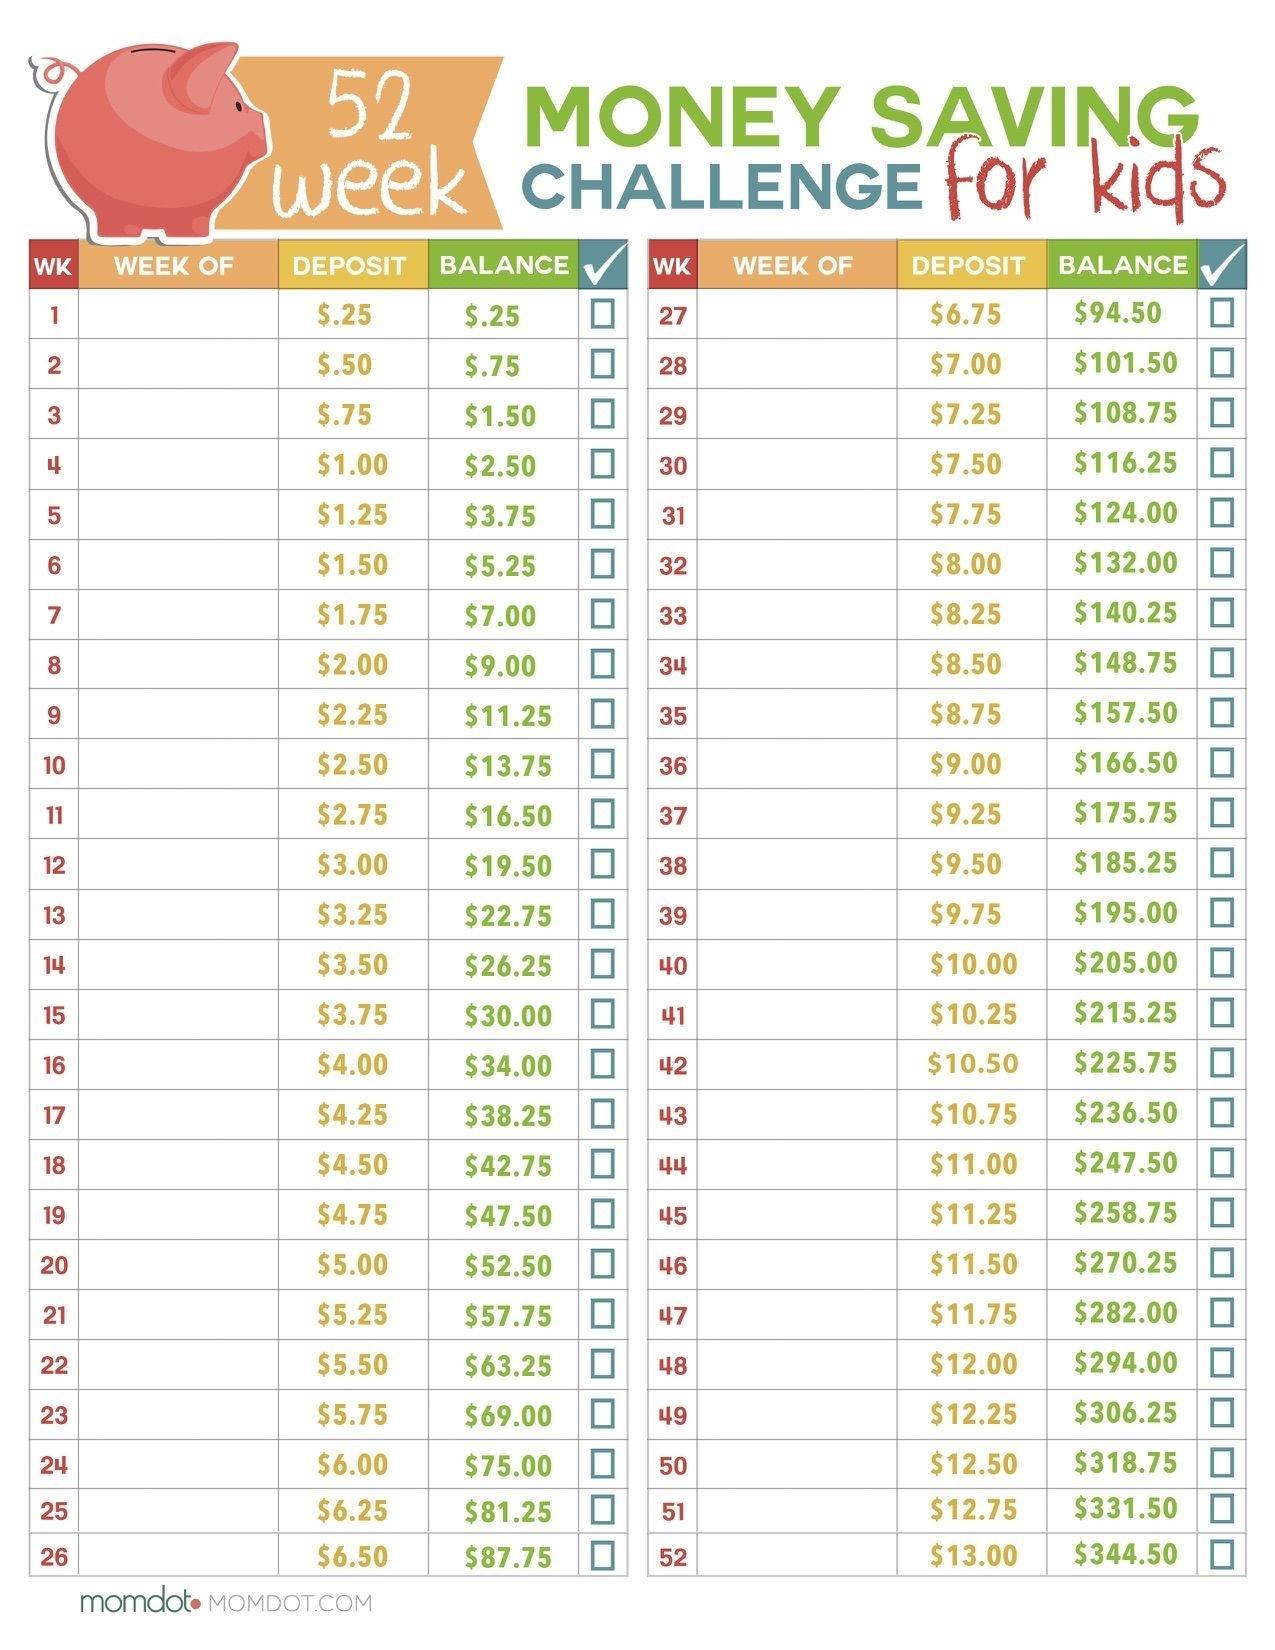 52 Week Money Challenge For Kids | Kids Money, 52 Week Money